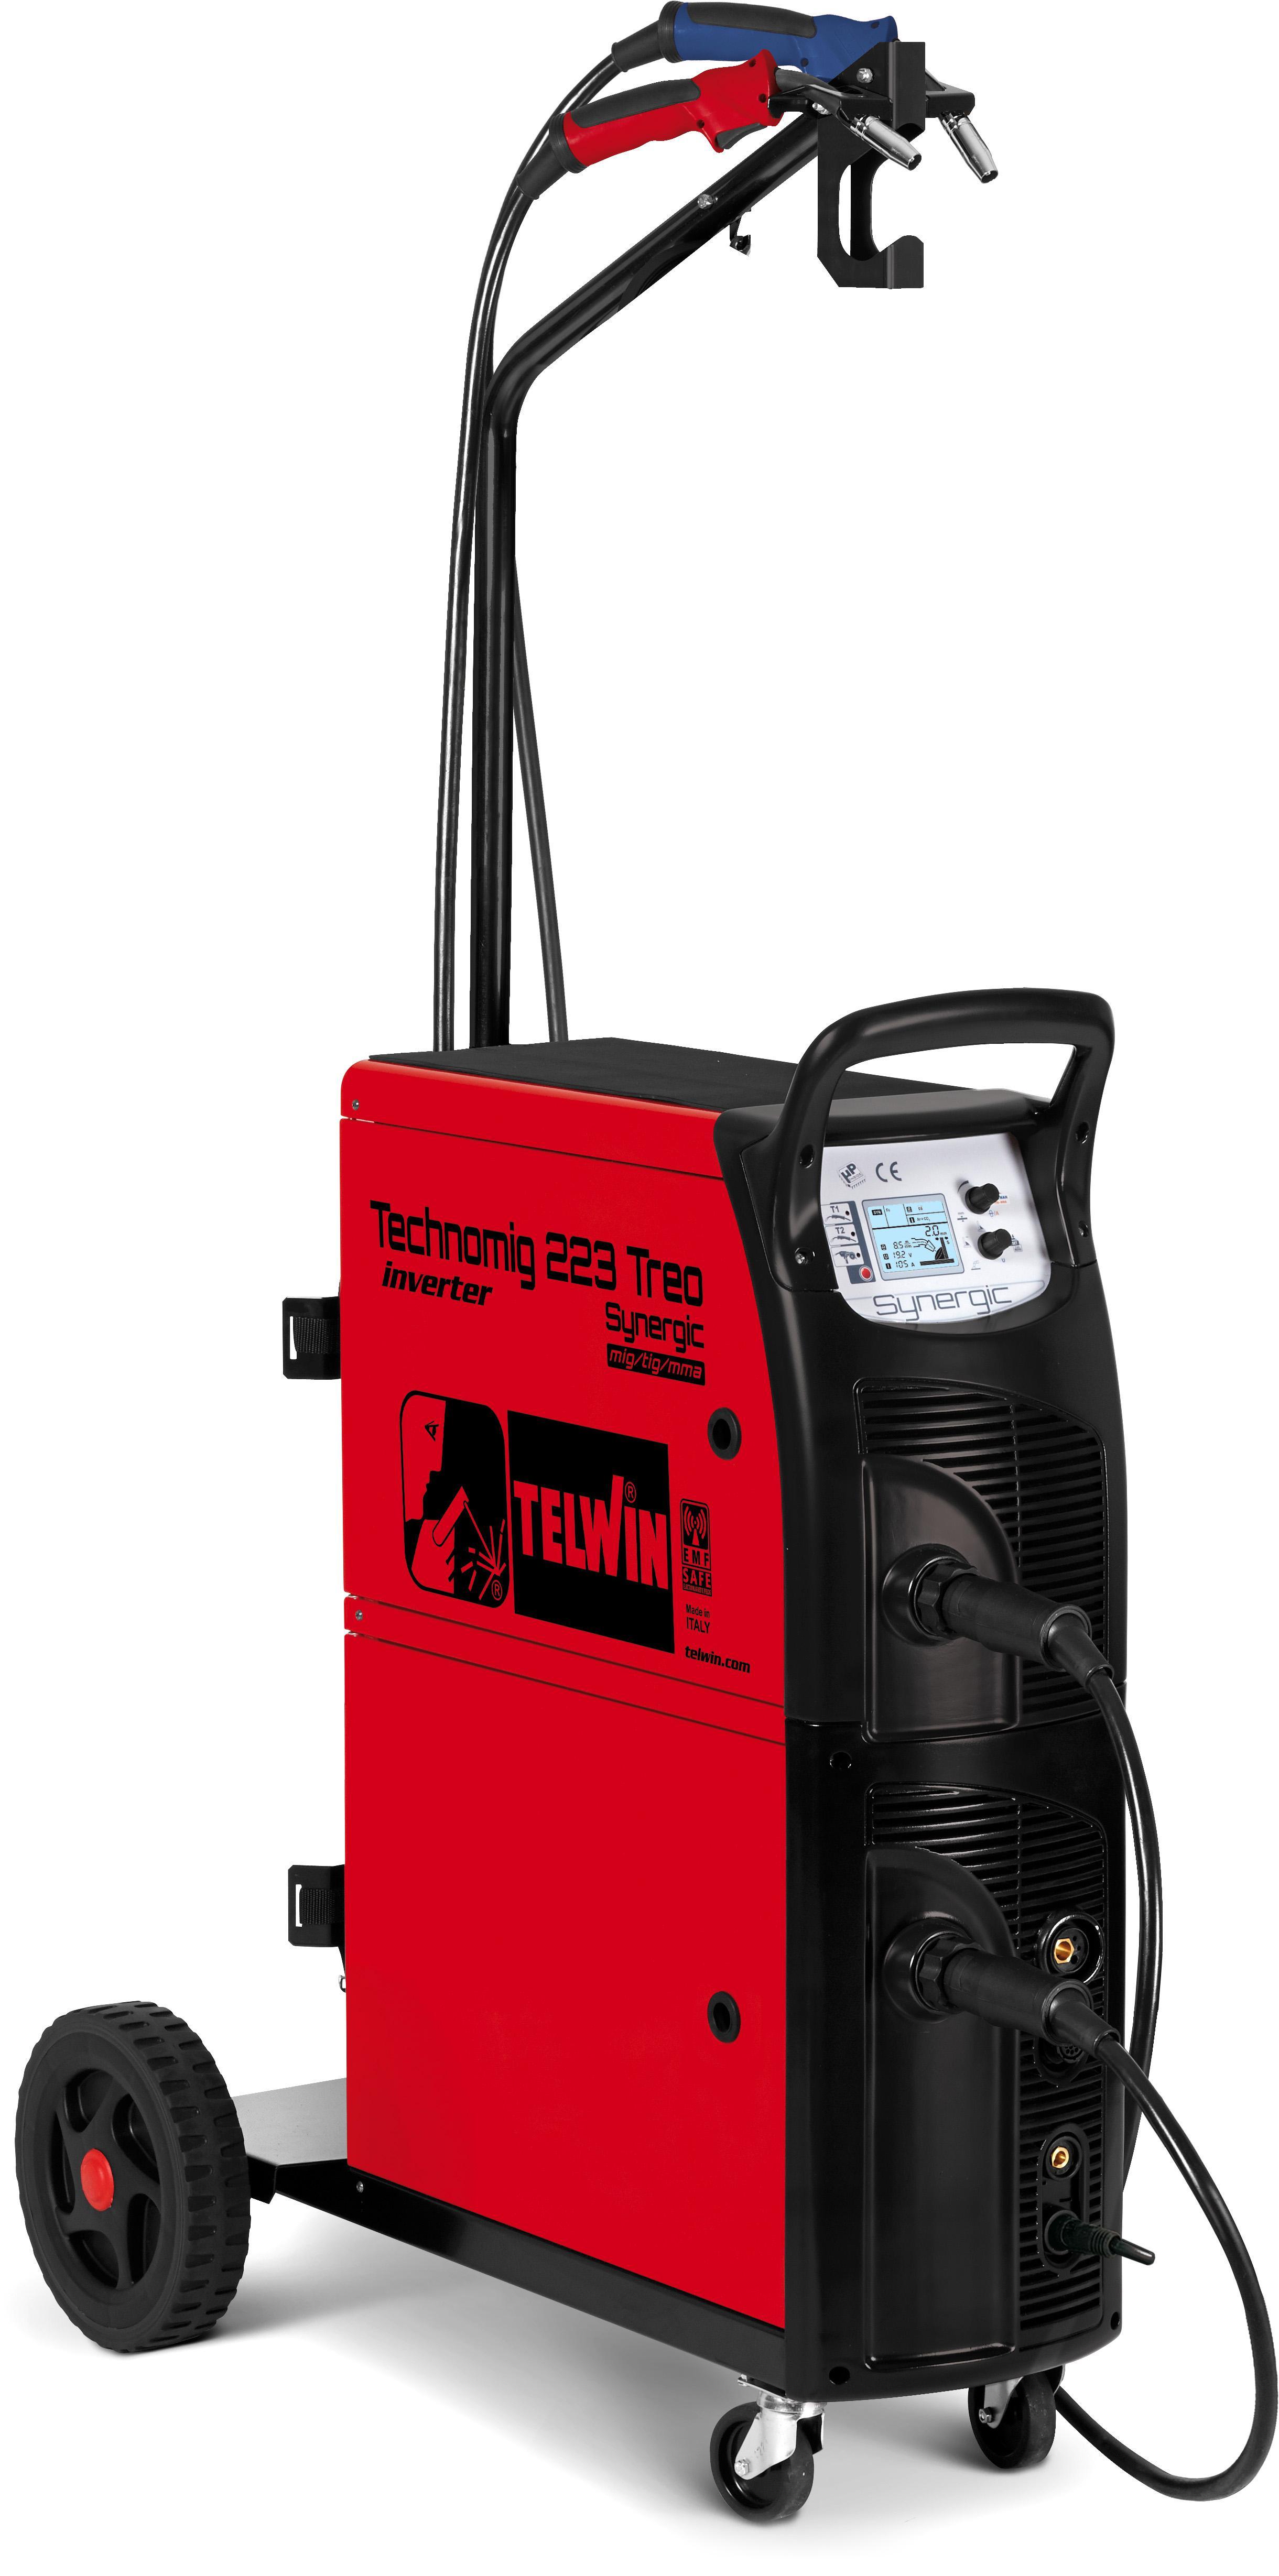 Сварочный аппарат Telwin Technomig 223 treo synergic  - Купить